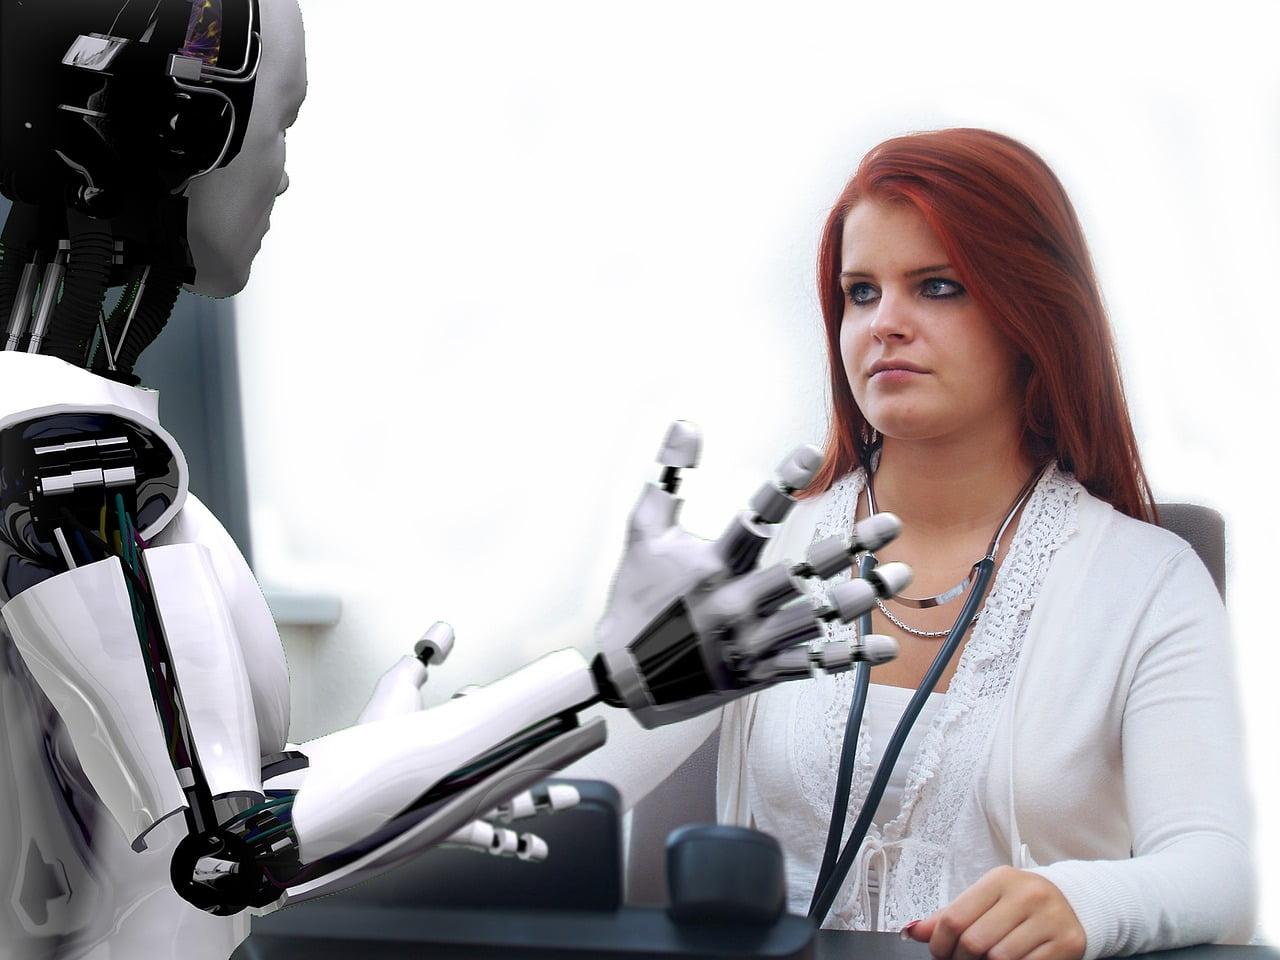 Robot. Photo via Honda's YouTube